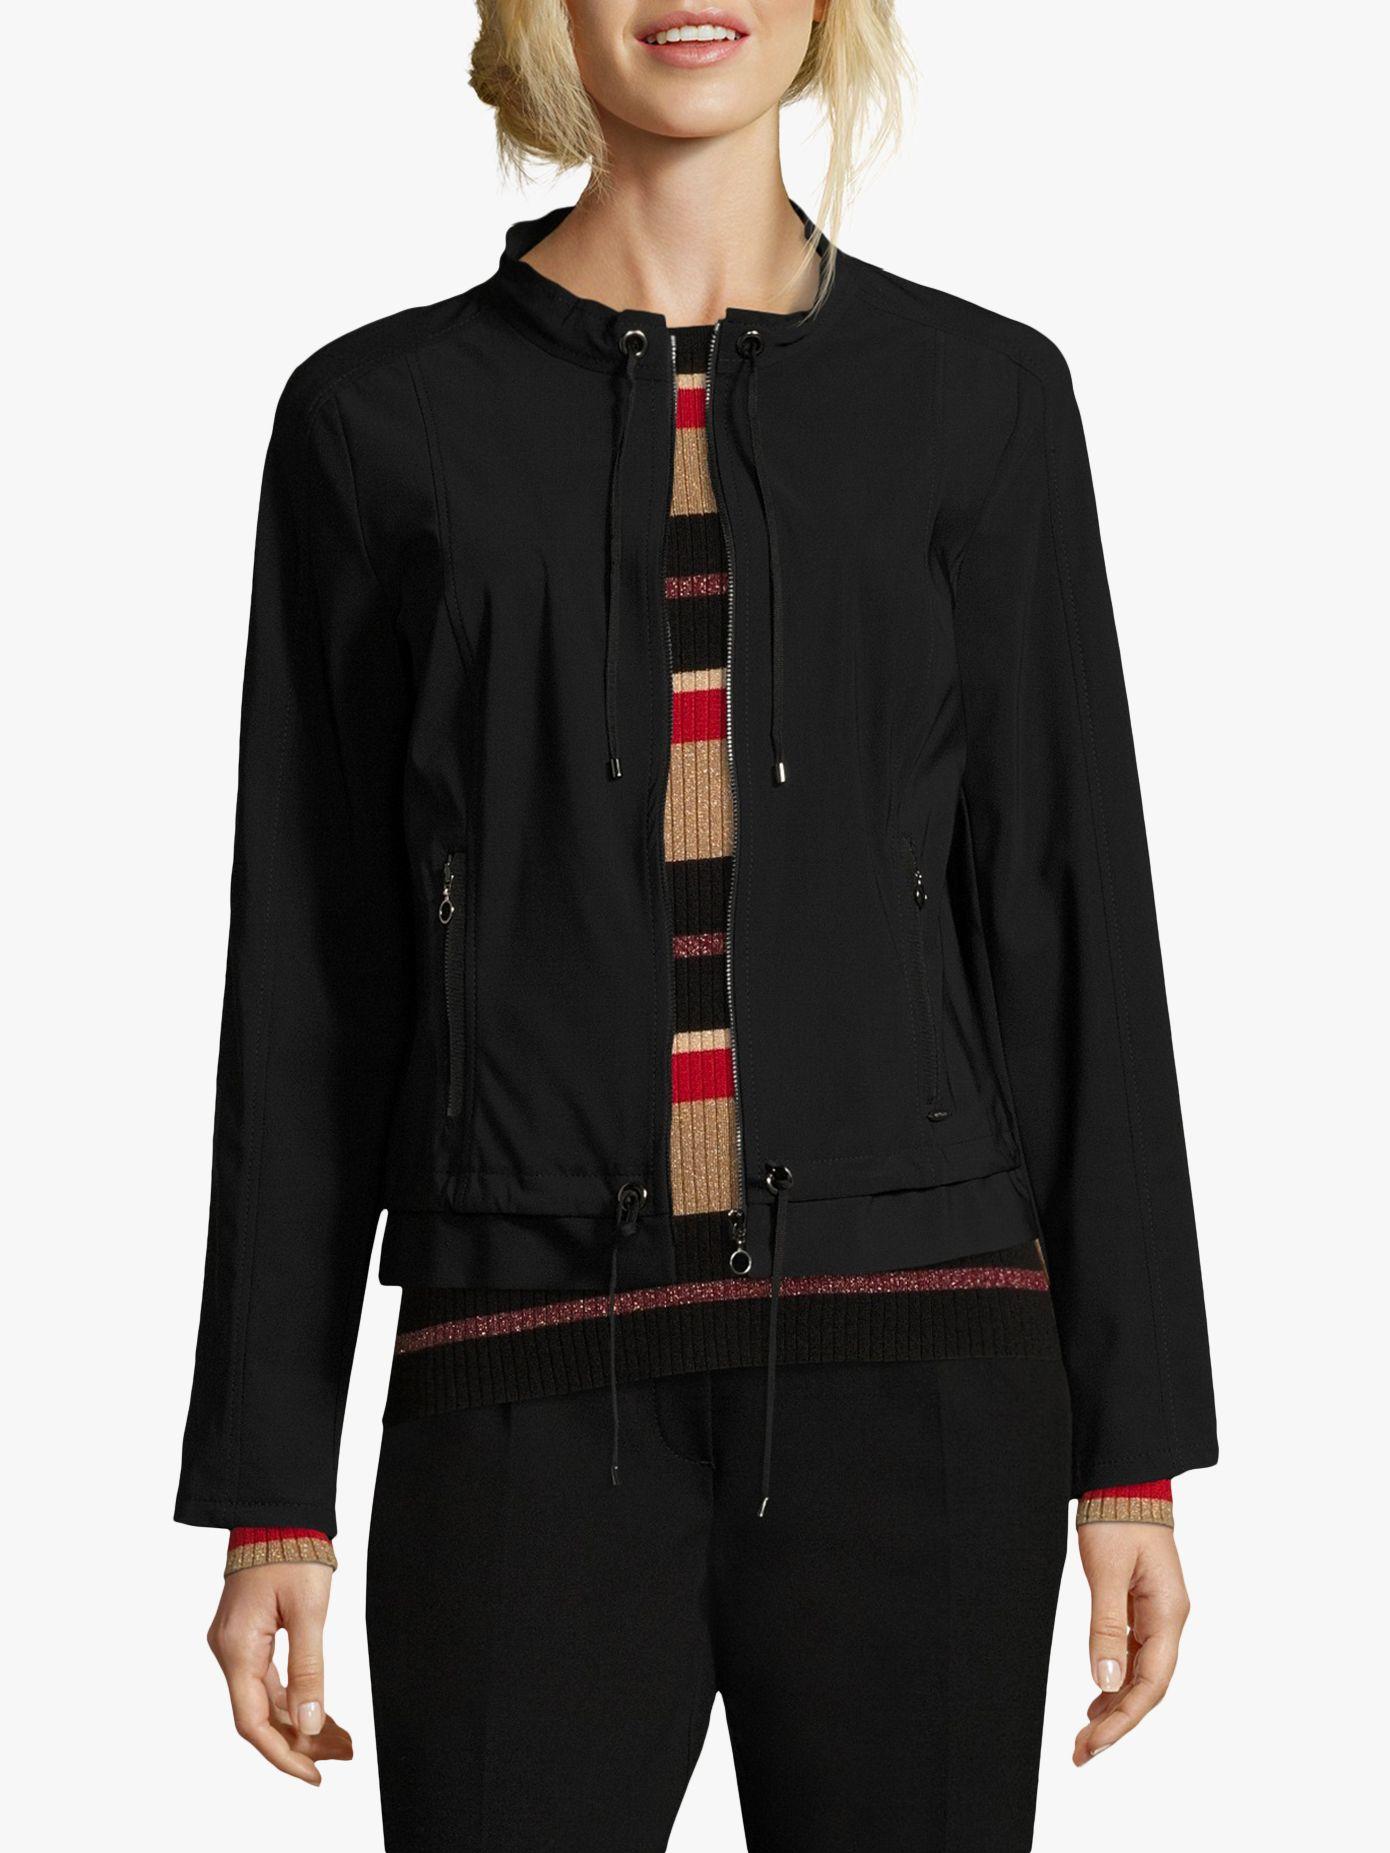 Betty & Co. Betty & Co. Blouson Jacket, Black